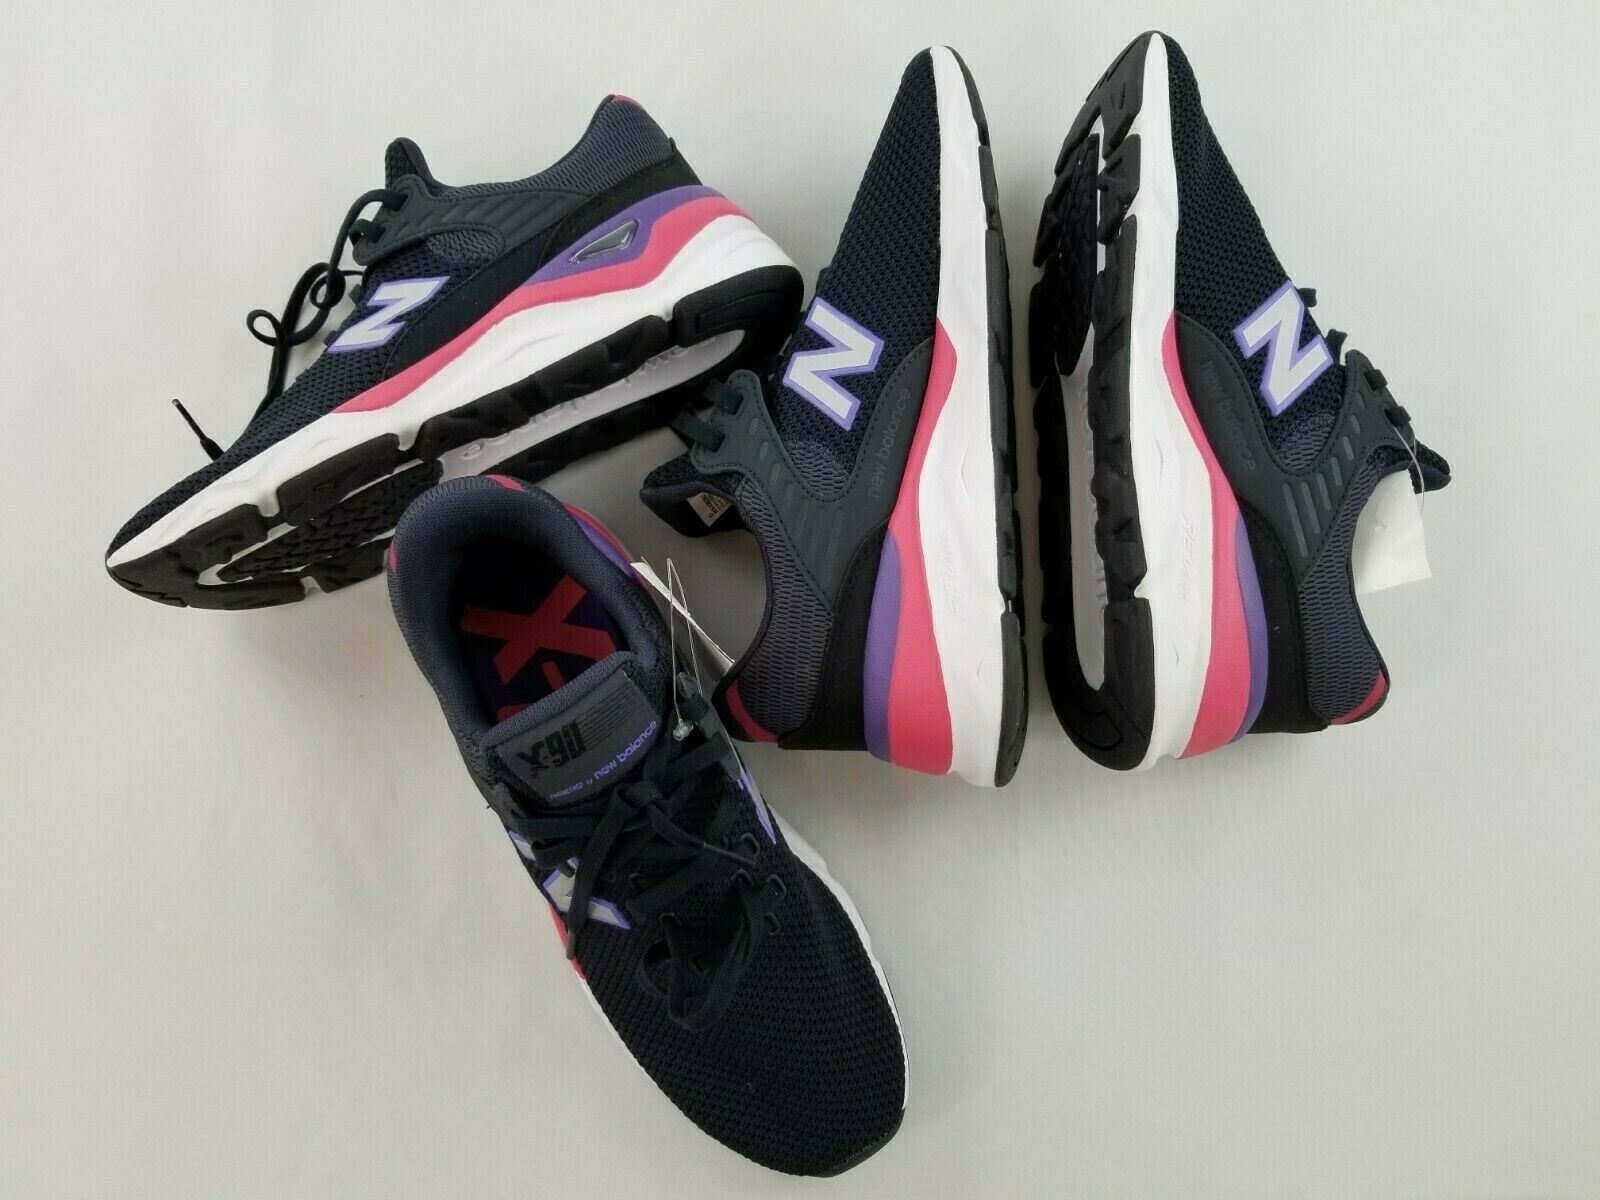 Neu New Balance Herren Schuhe Sneakers X-90 Laufen MSX90CRC Grau 7.5 D Msrp image 11